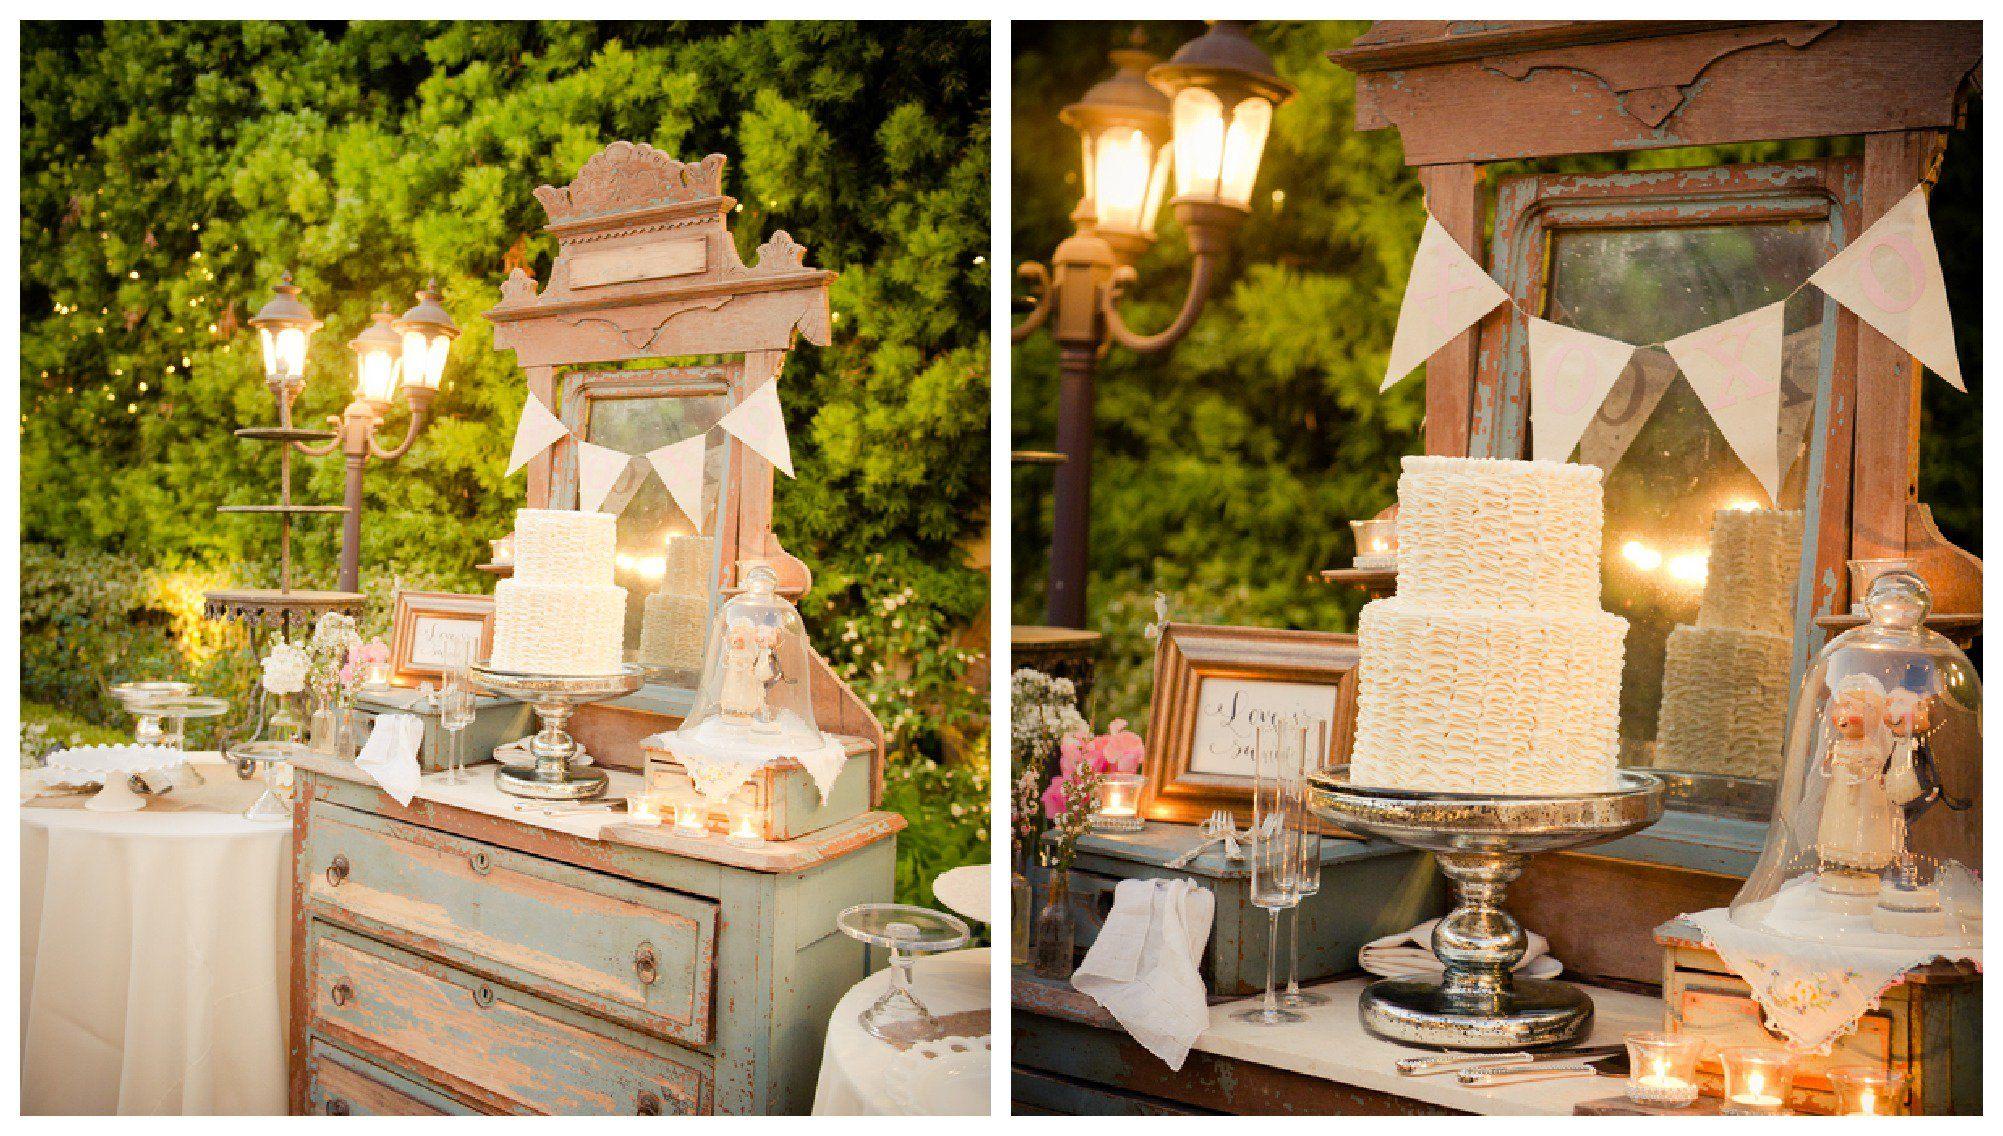 Vintage style wedding decoration ideas  Setting  Camp K nu A  Pinterest  Rustic wedding chic Wedding